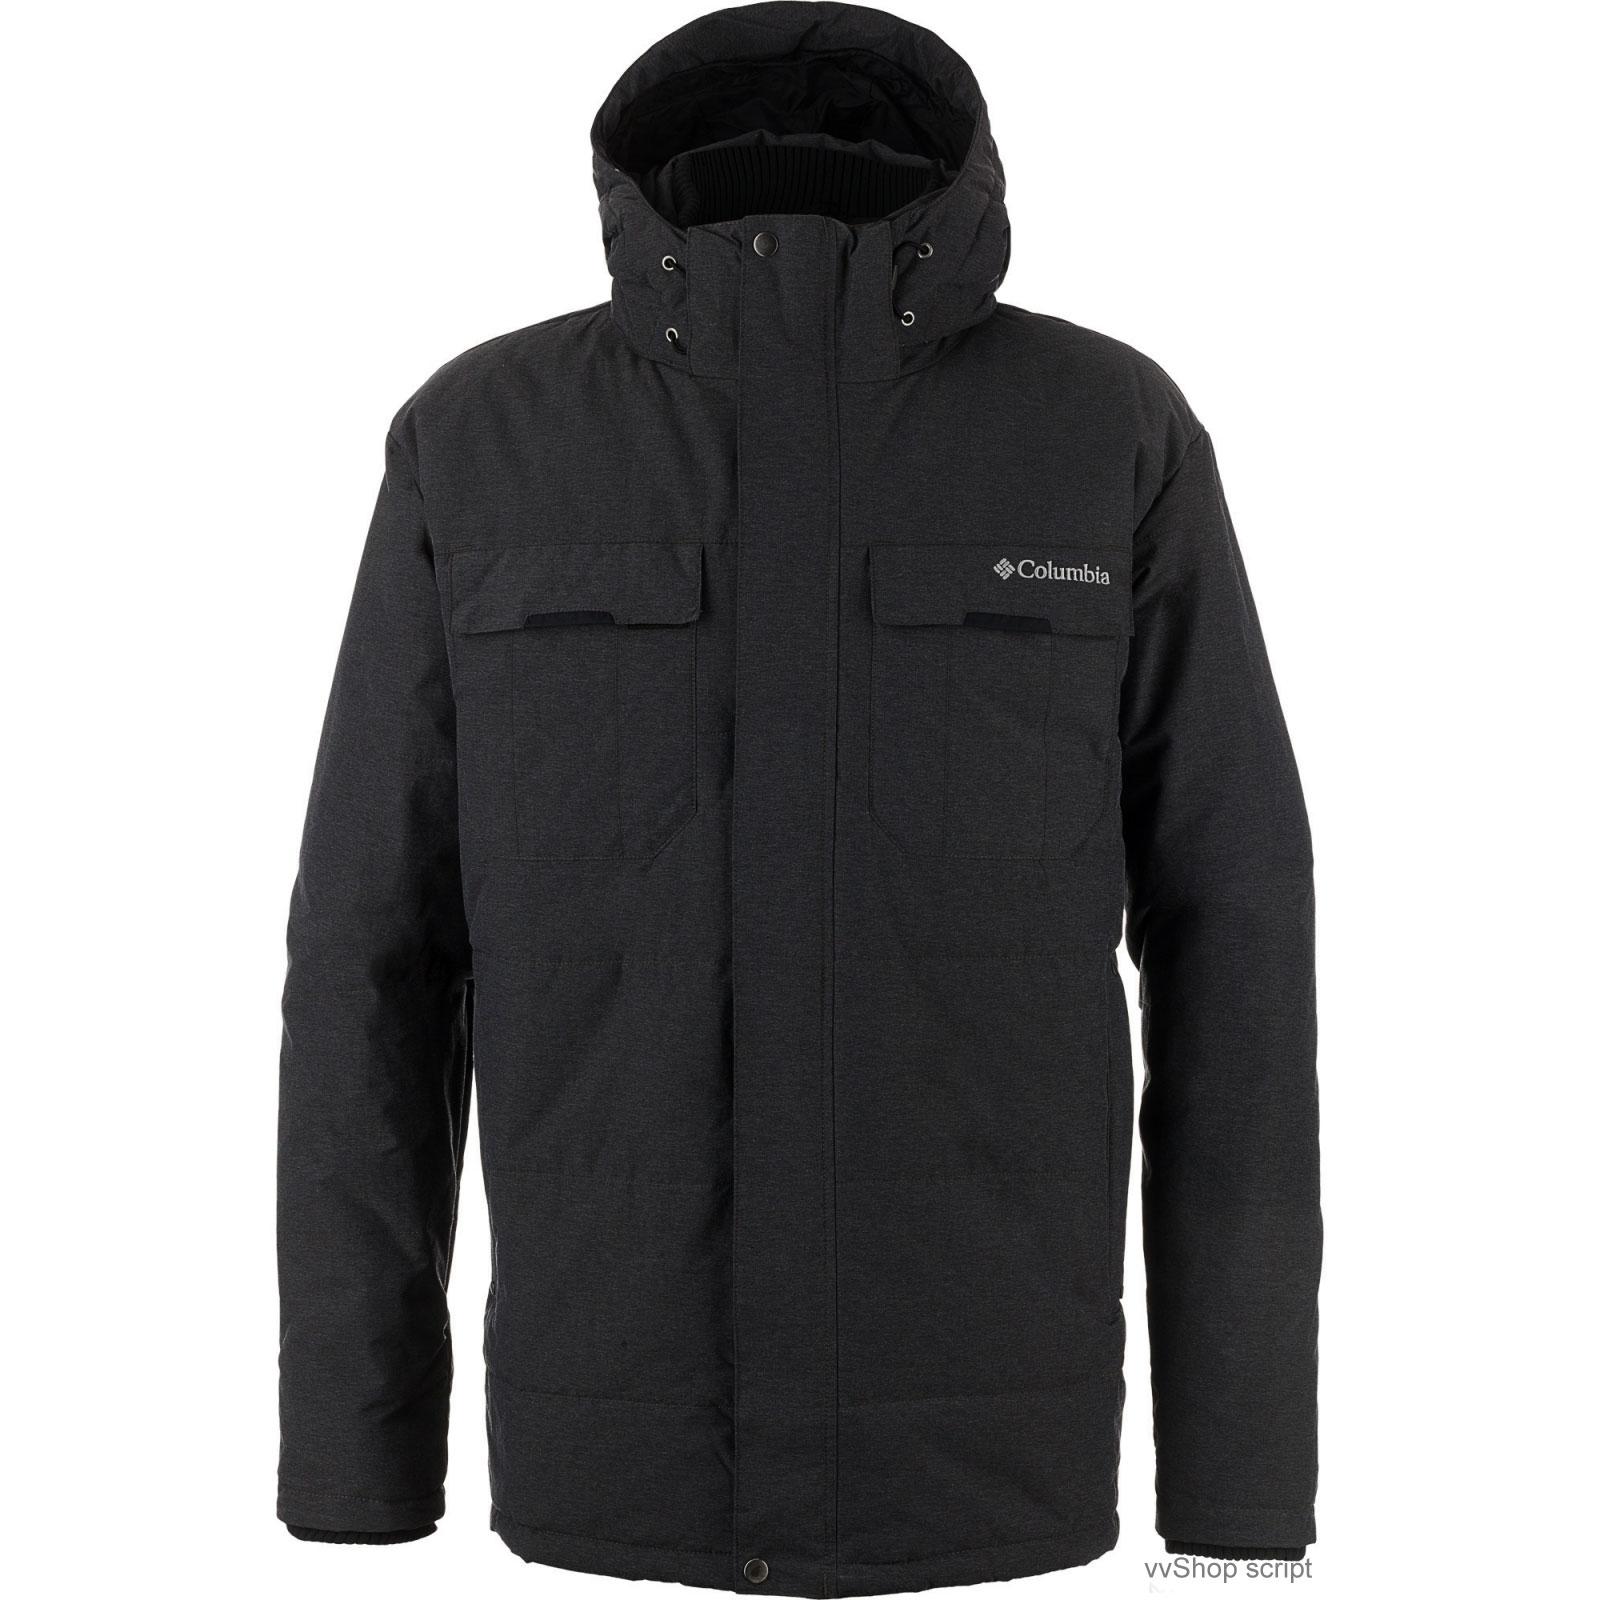 62a1afa26a99 ... Куртка мужская Columbia MOUNT TABOR Jacket. Суперцена